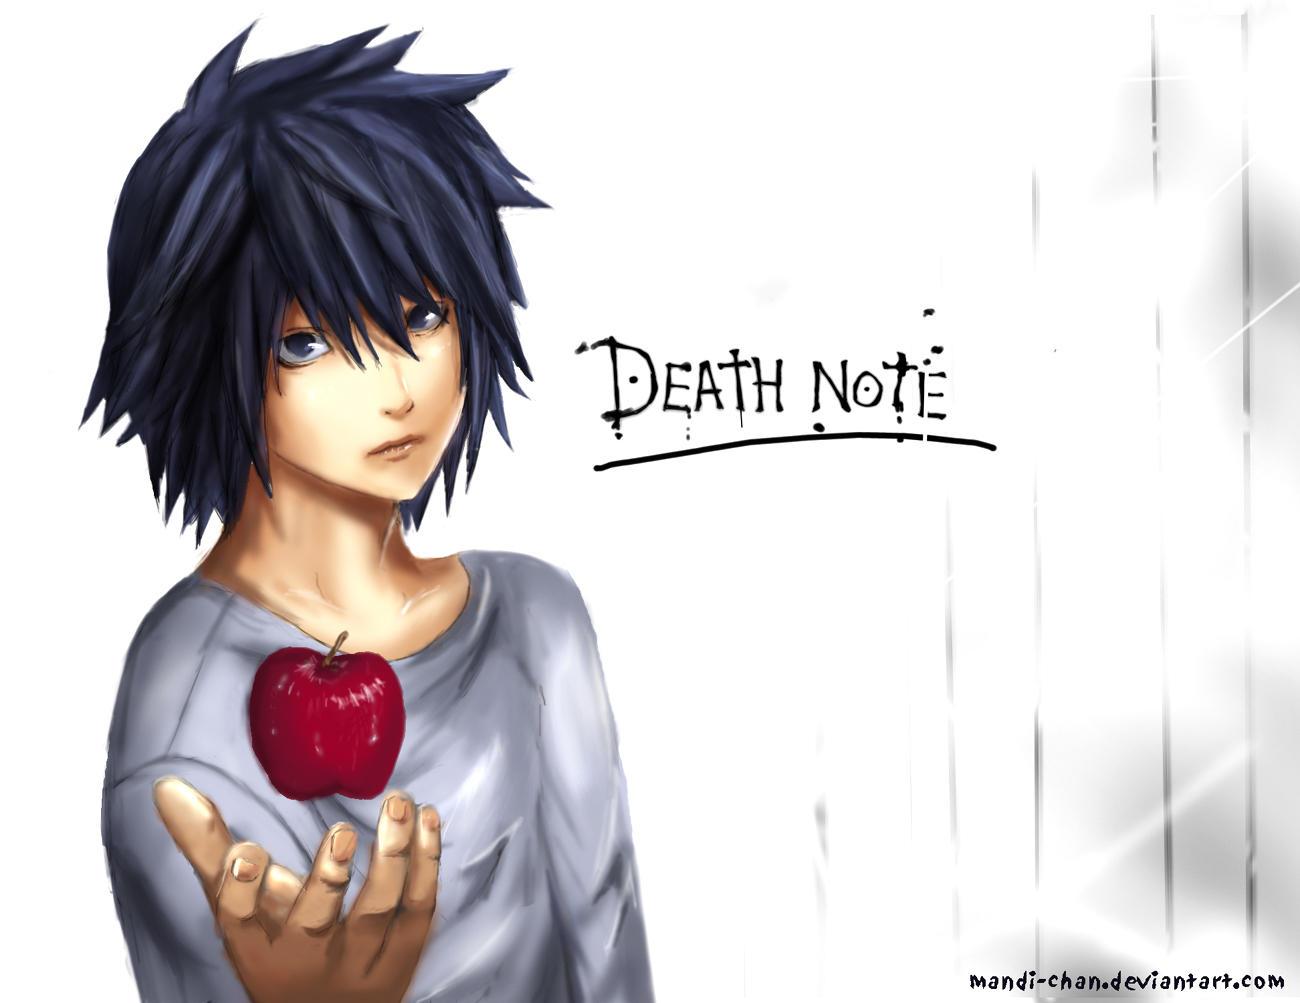 _L__Death_Note_by_mandi_chan